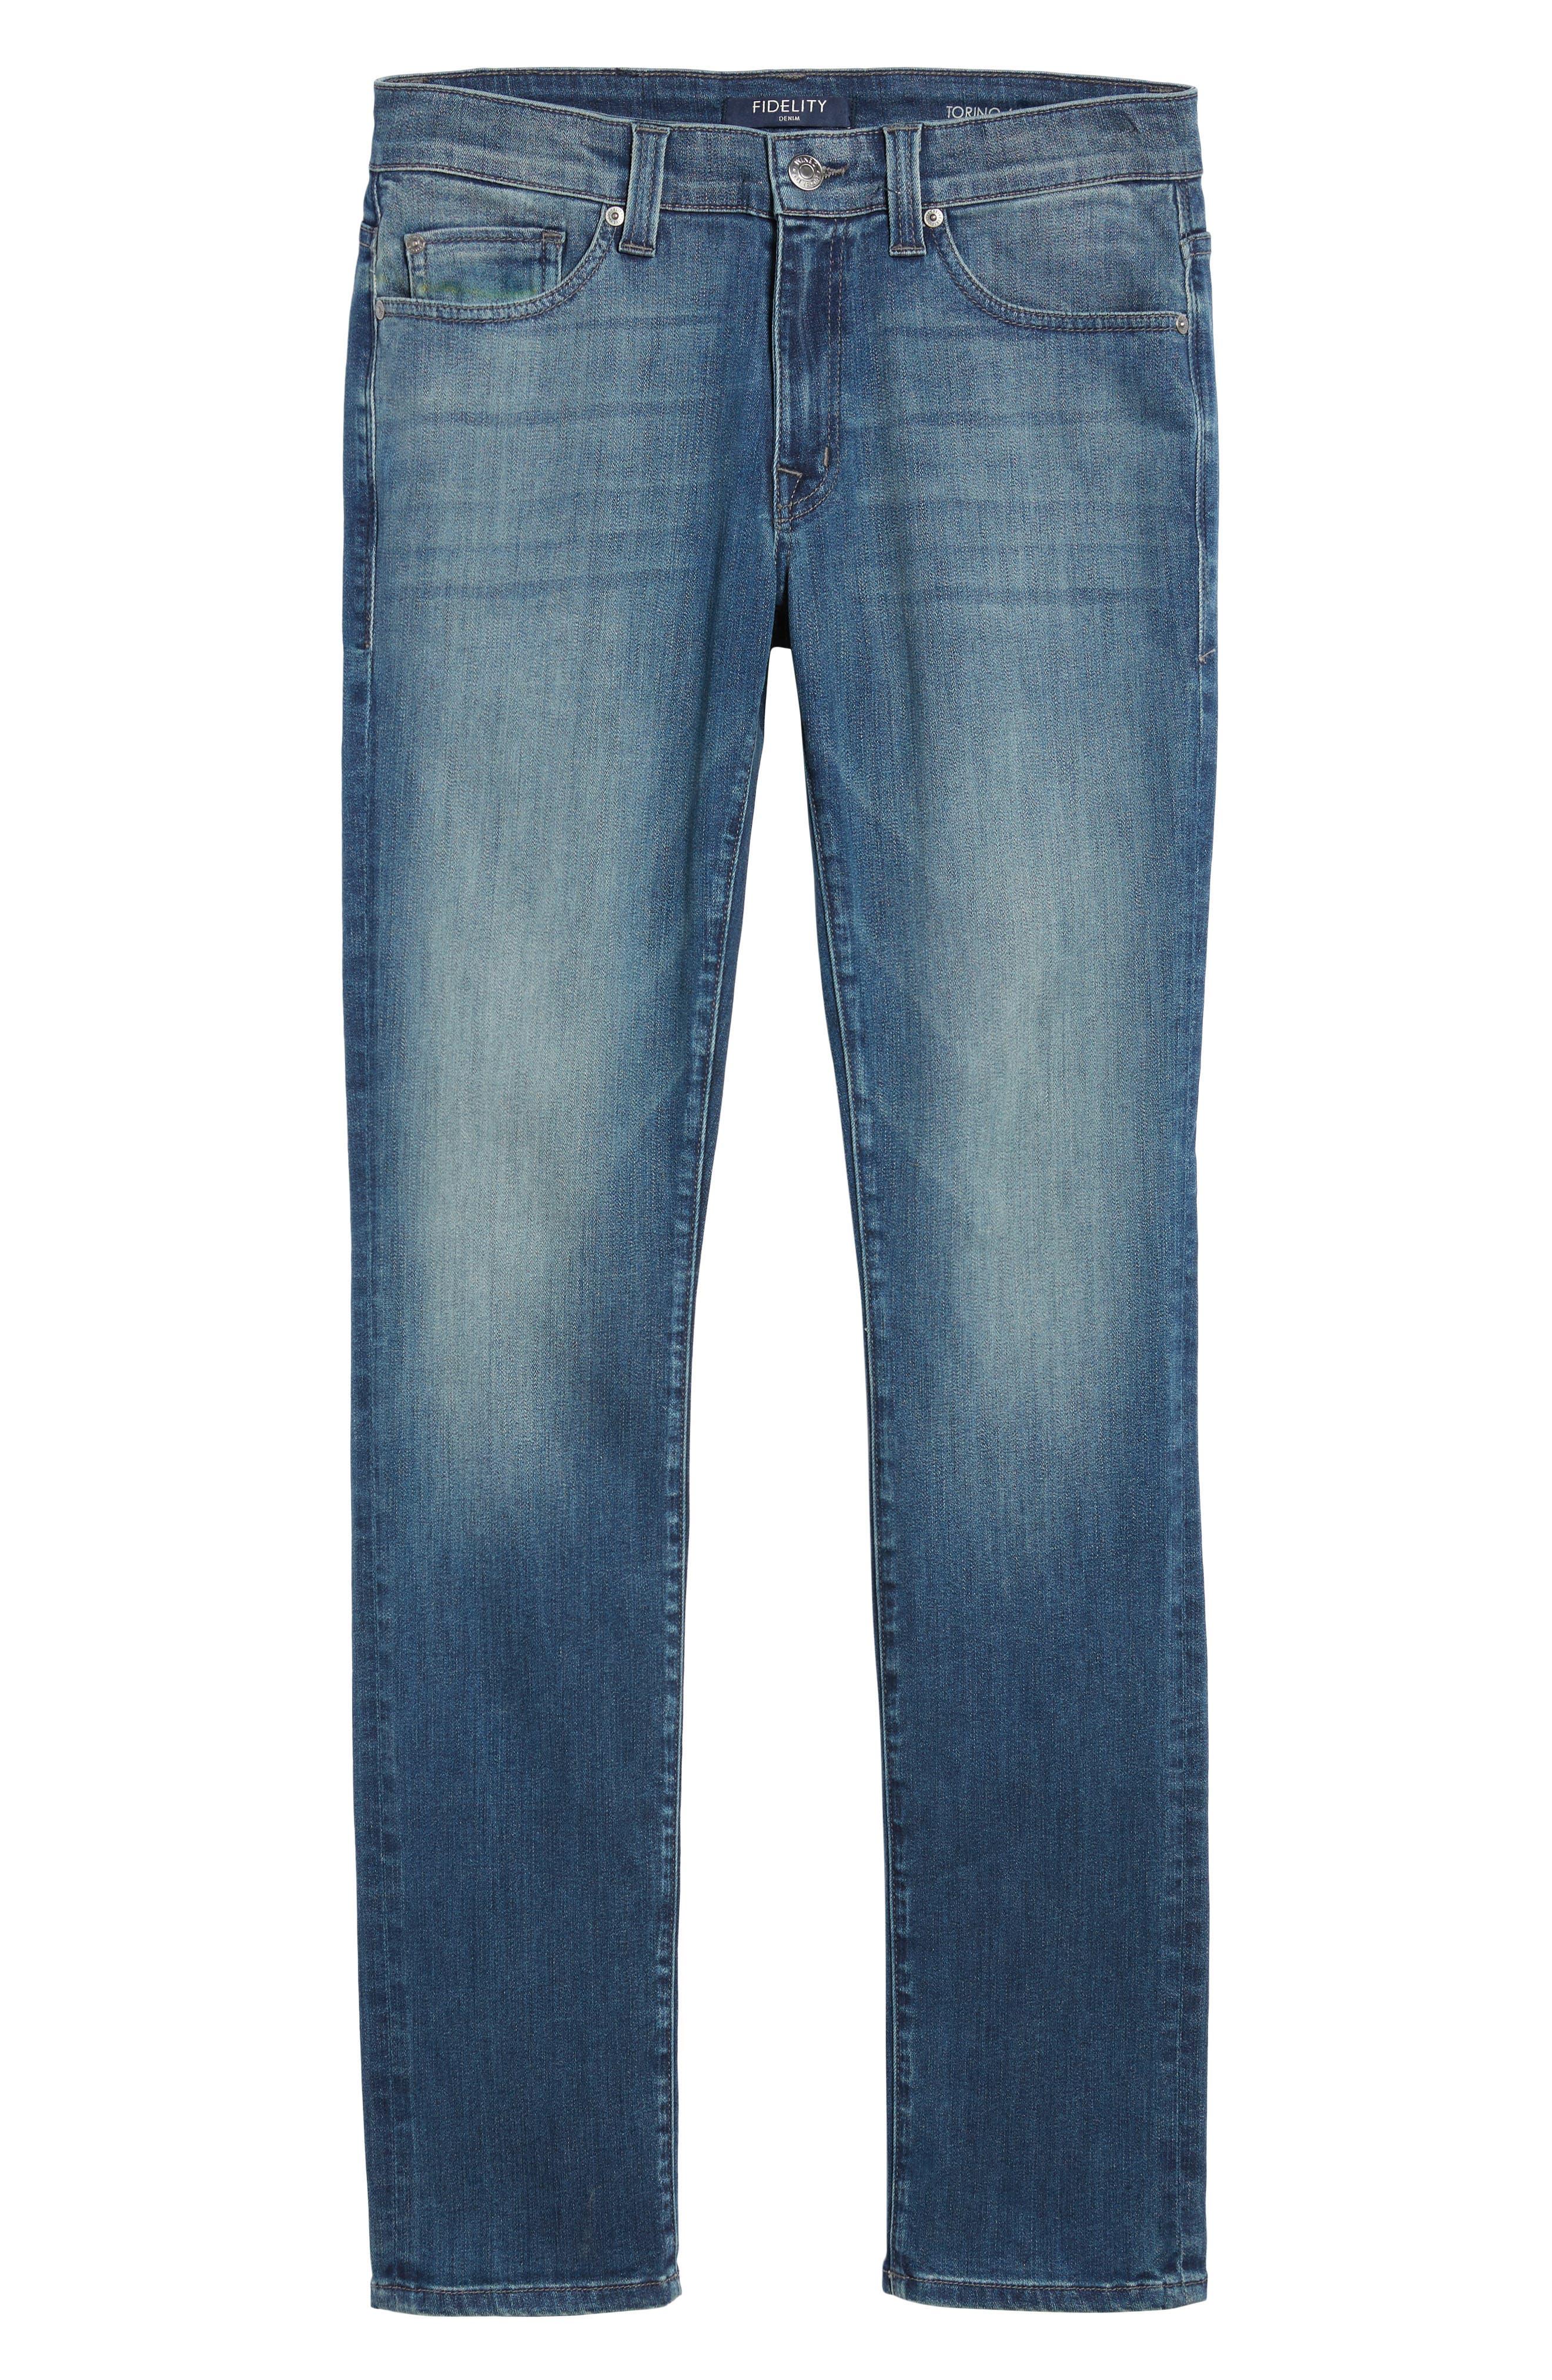 Torino Slim Fit Jeans,                             Alternate thumbnail 6, color,                             Atlas Blue